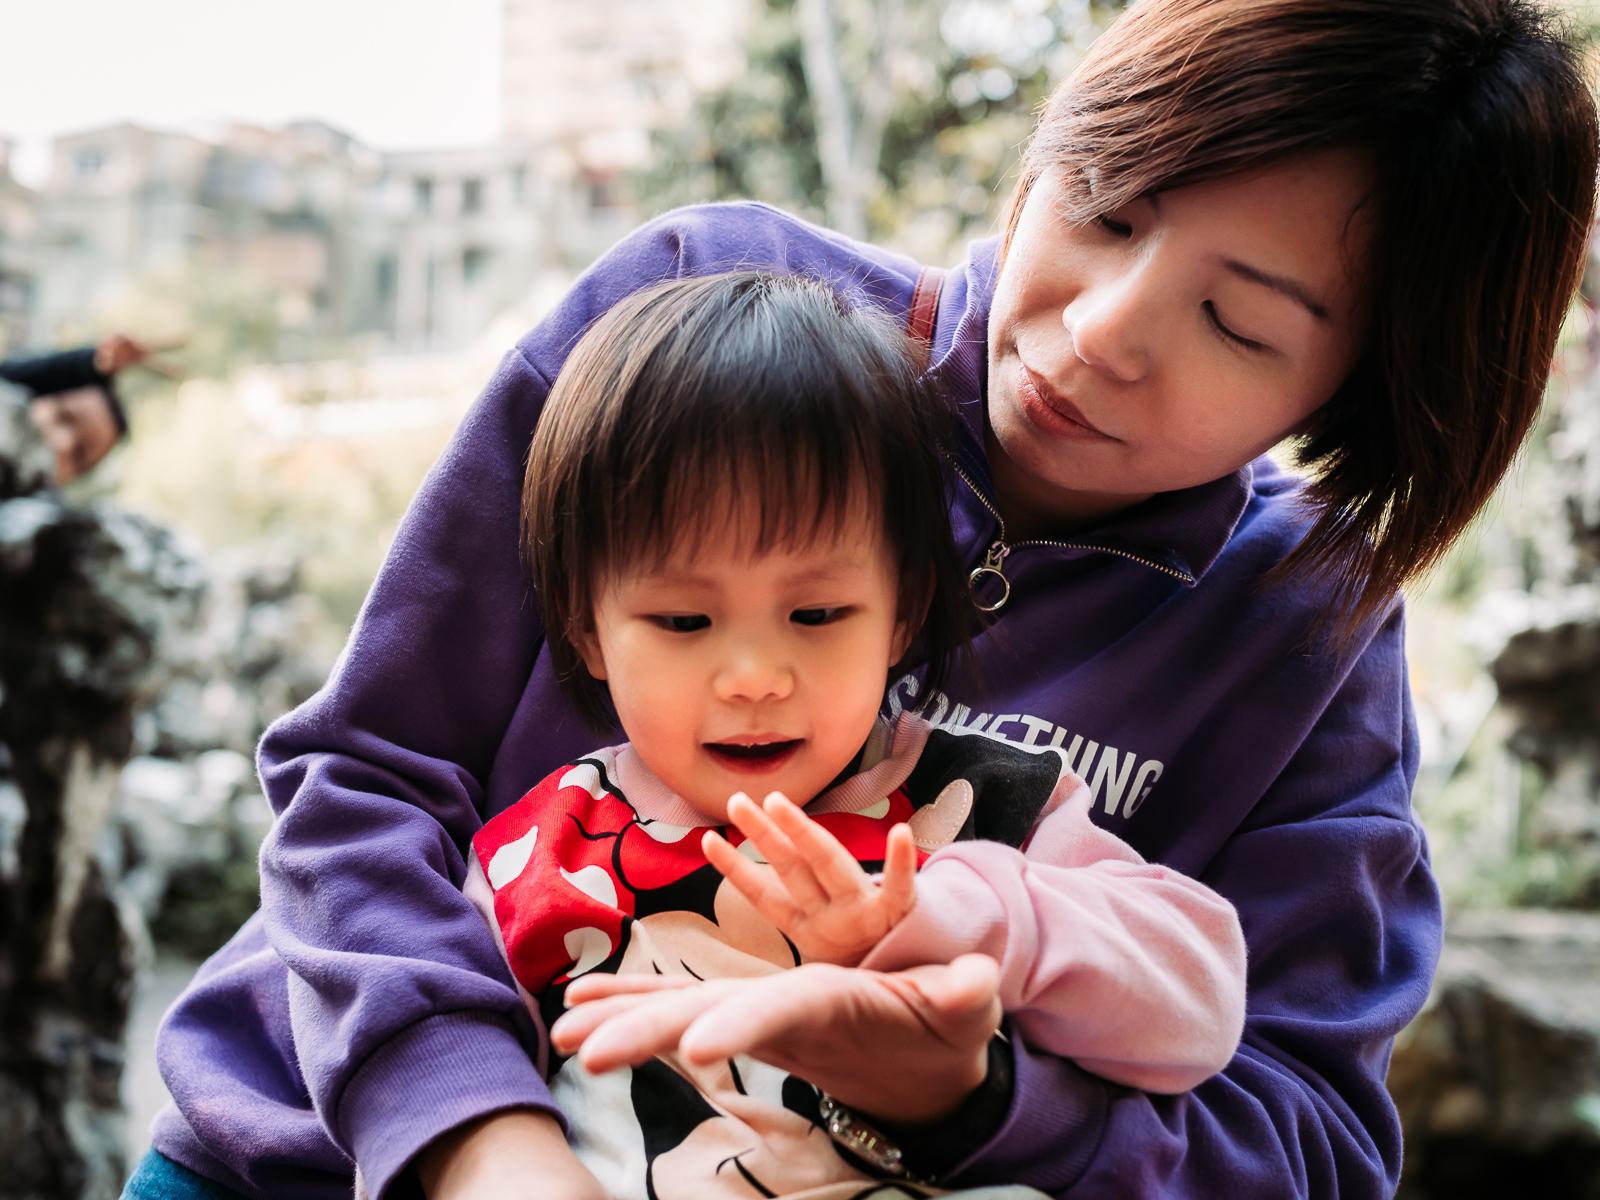 Eiffle Chan Family Portrait - Olympus EMaMarkii2512 - Yes! Please Enjoy by Fanning Tseng-45.jpg